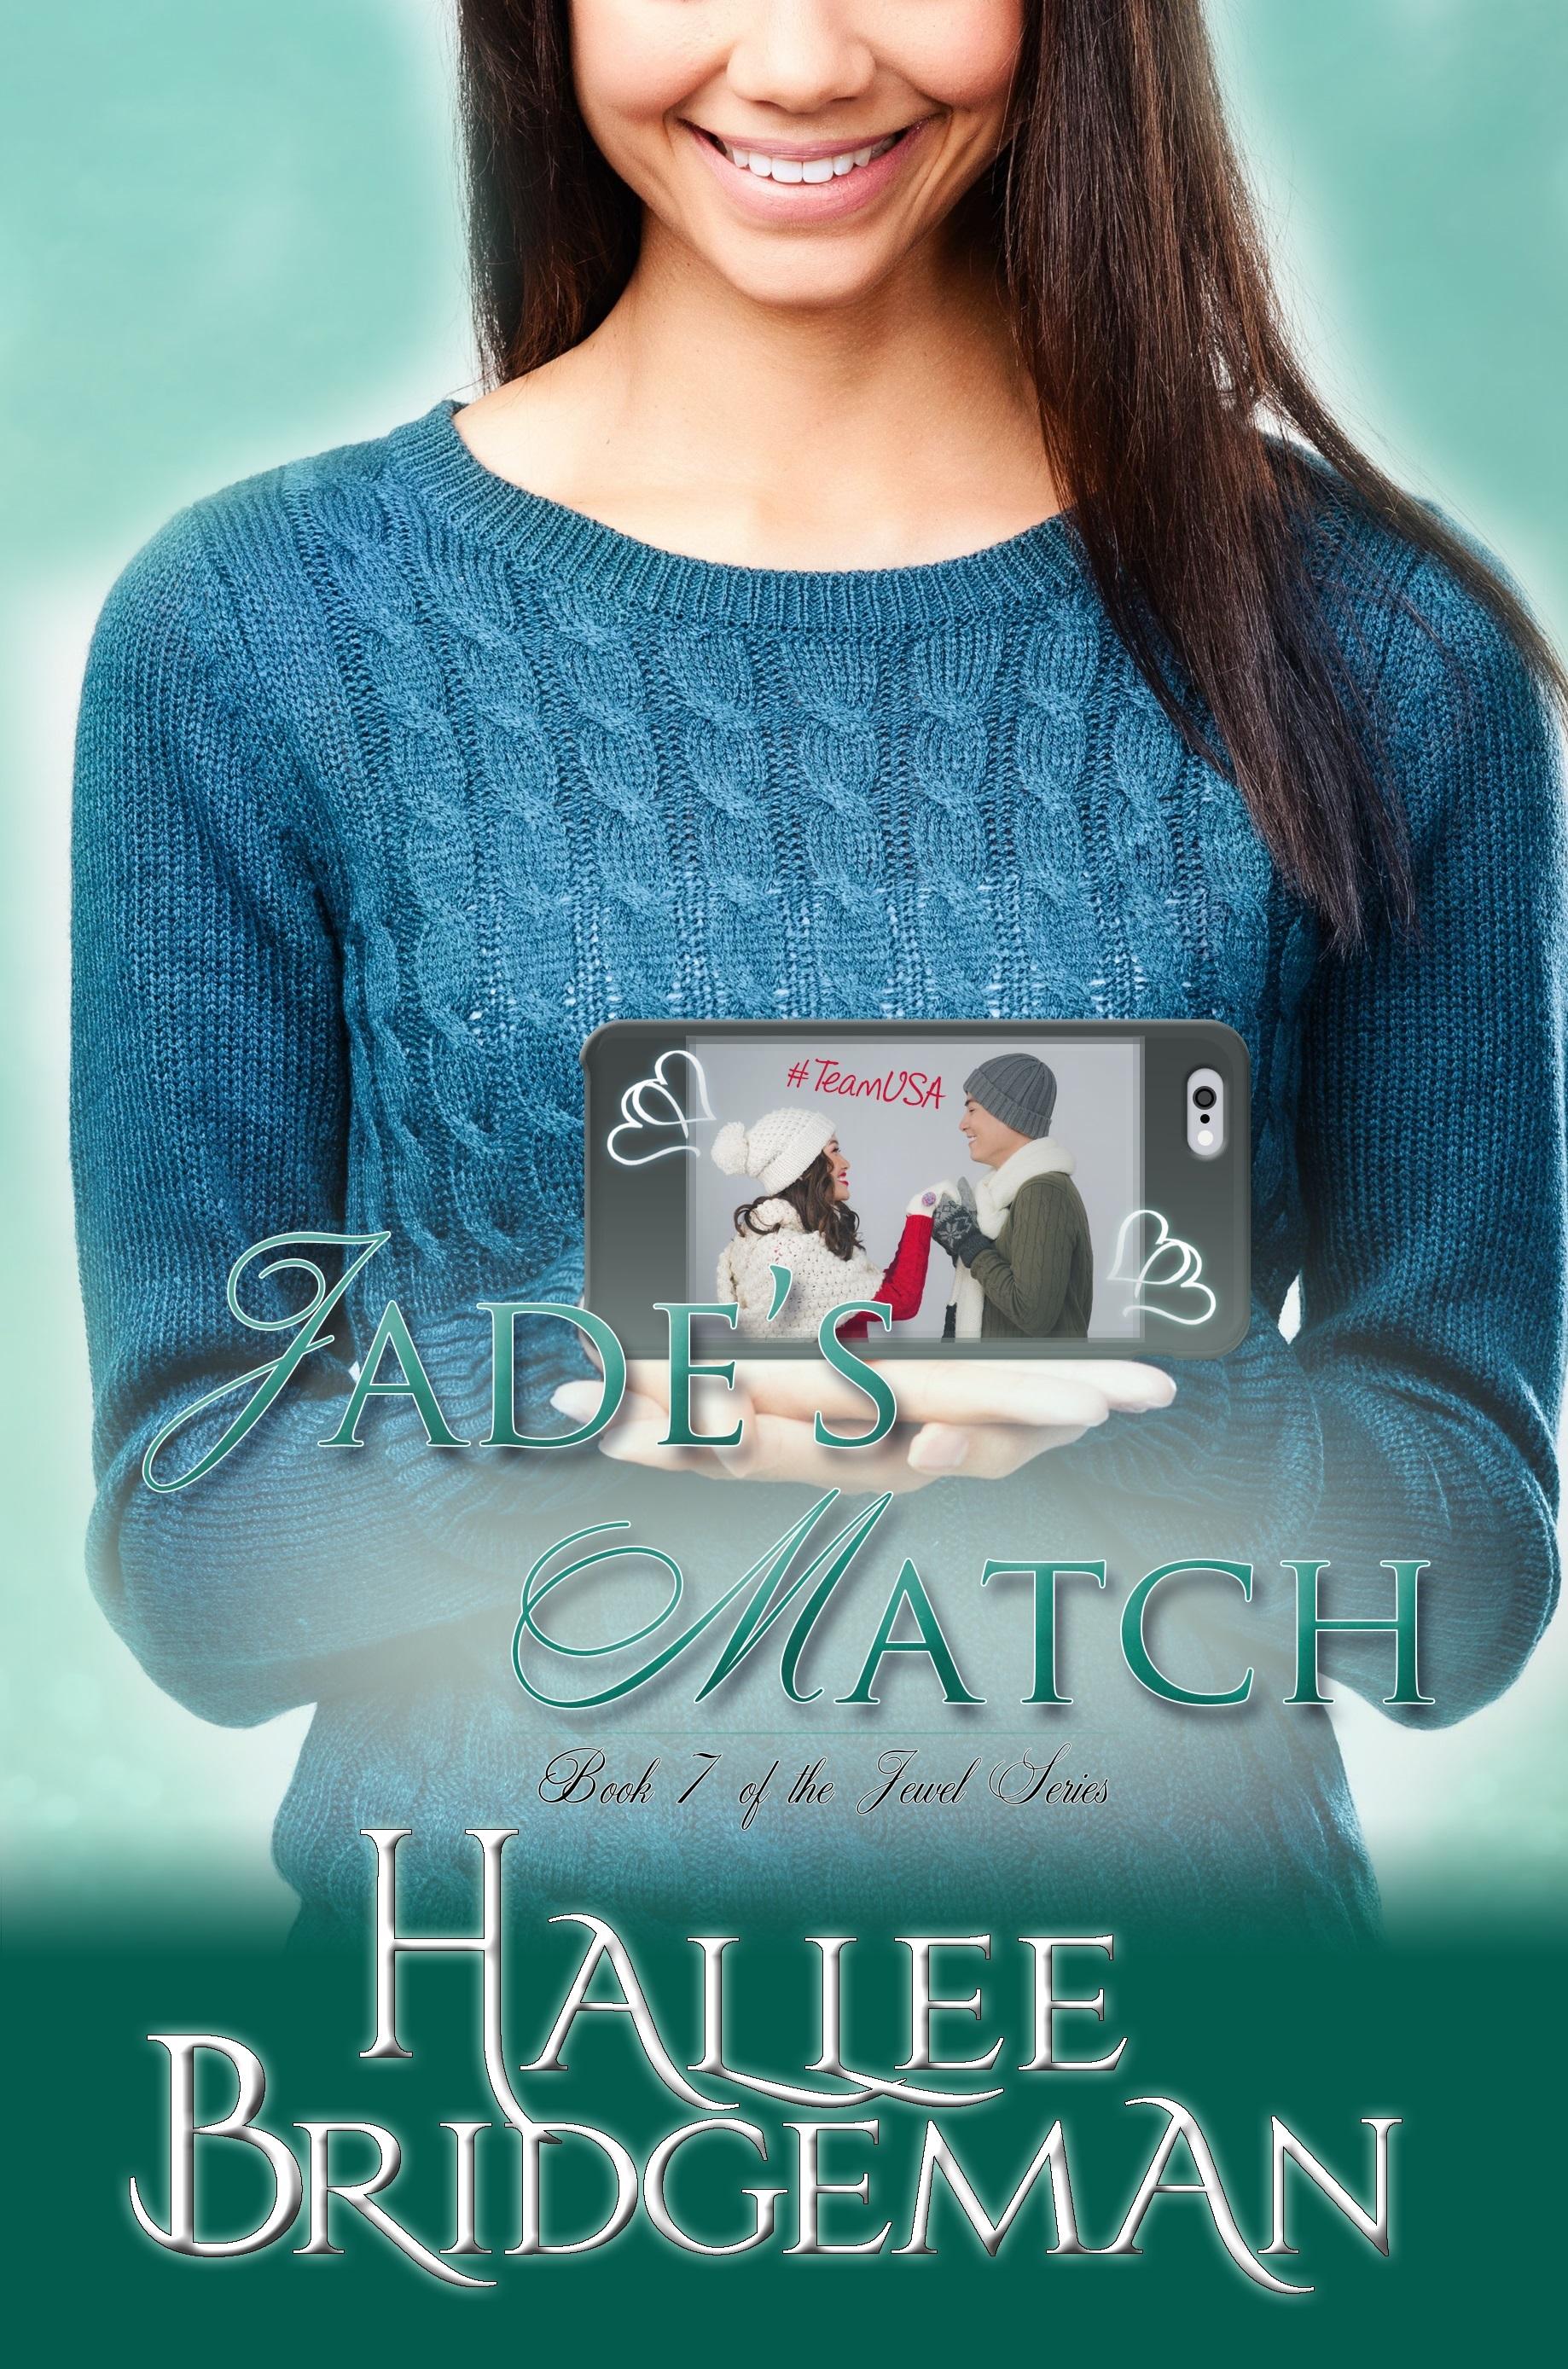 Jade's Match